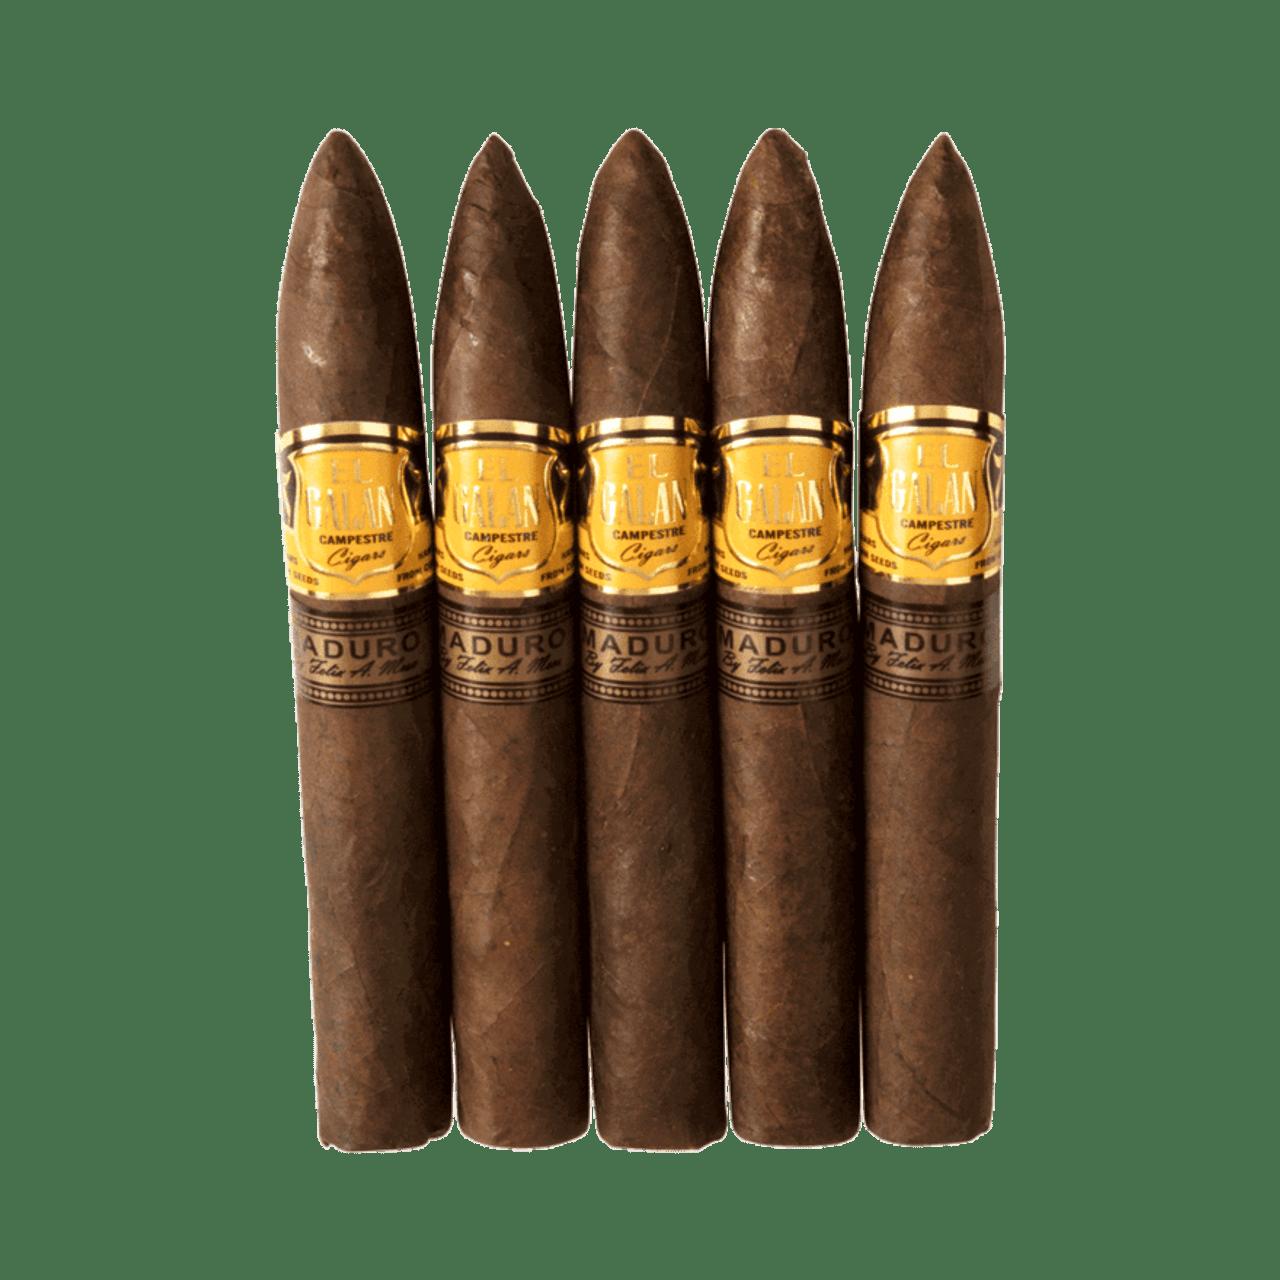 El Galan Campestre Torpedo Maduro Cigars - 6.5 x 52 (Pack of 5)